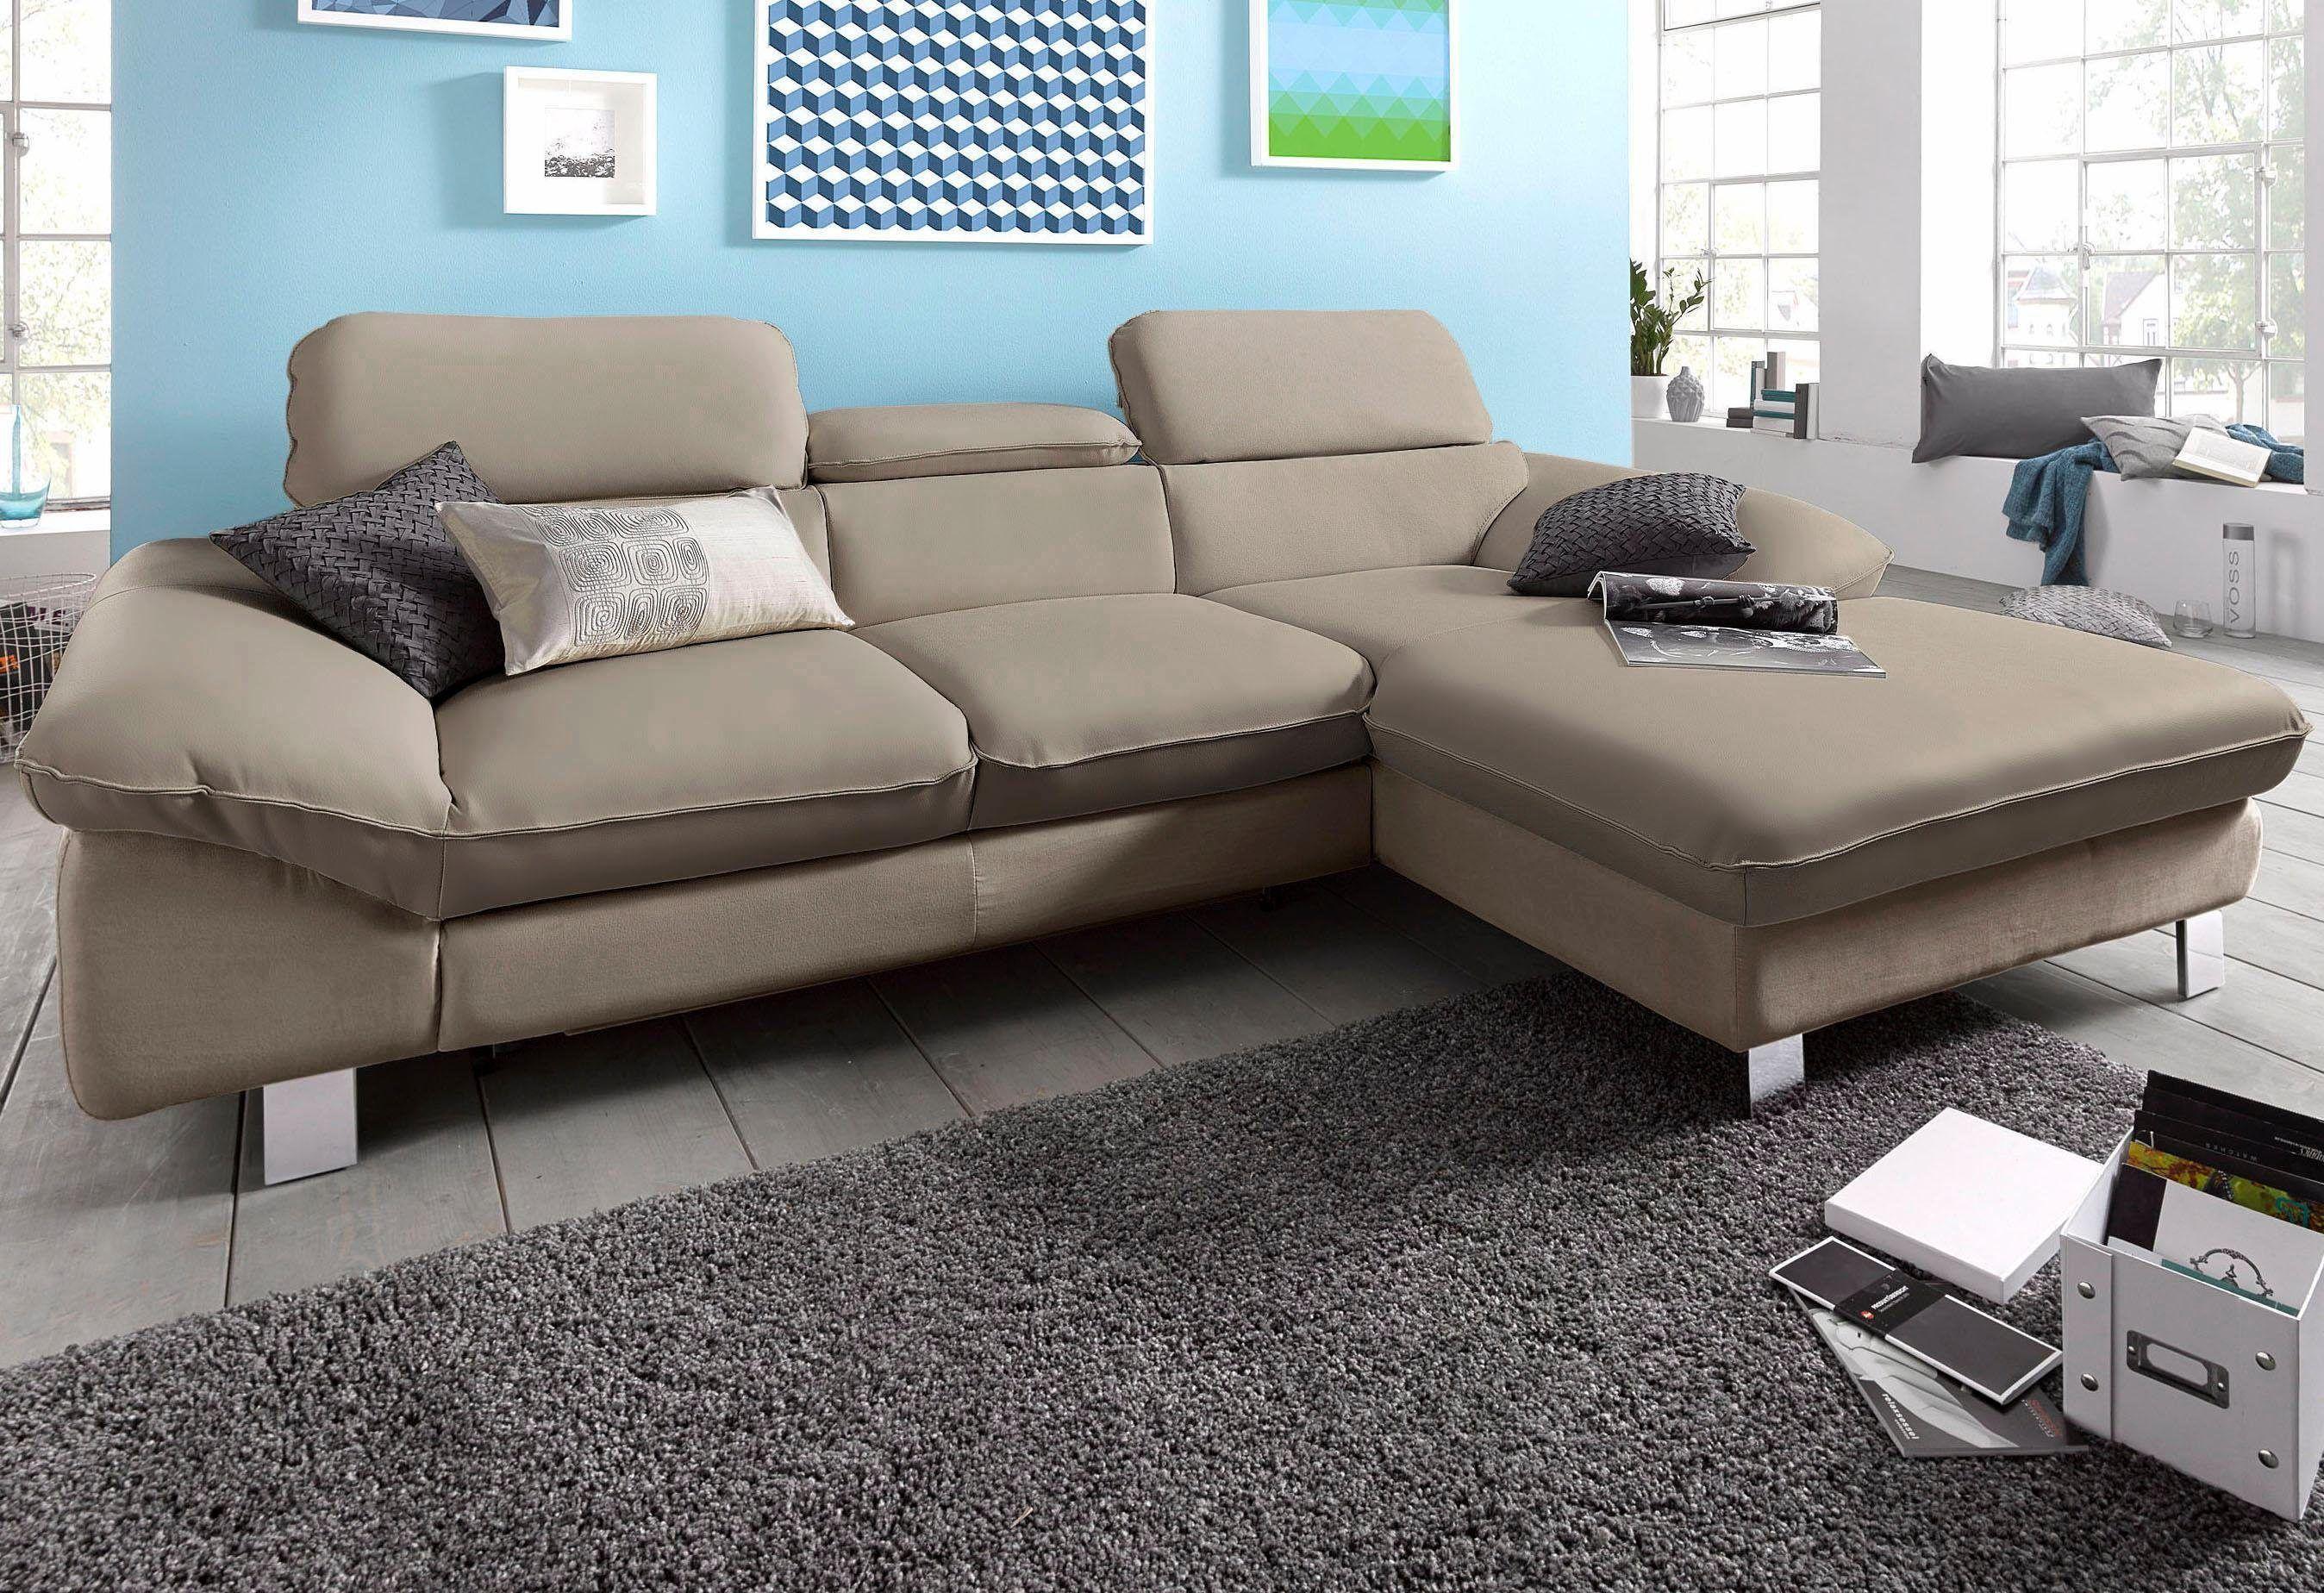 polsterecke otto xxl with polsterecke otto inosign polsterecke wahlweise mit with polsterecke. Black Bedroom Furniture Sets. Home Design Ideas